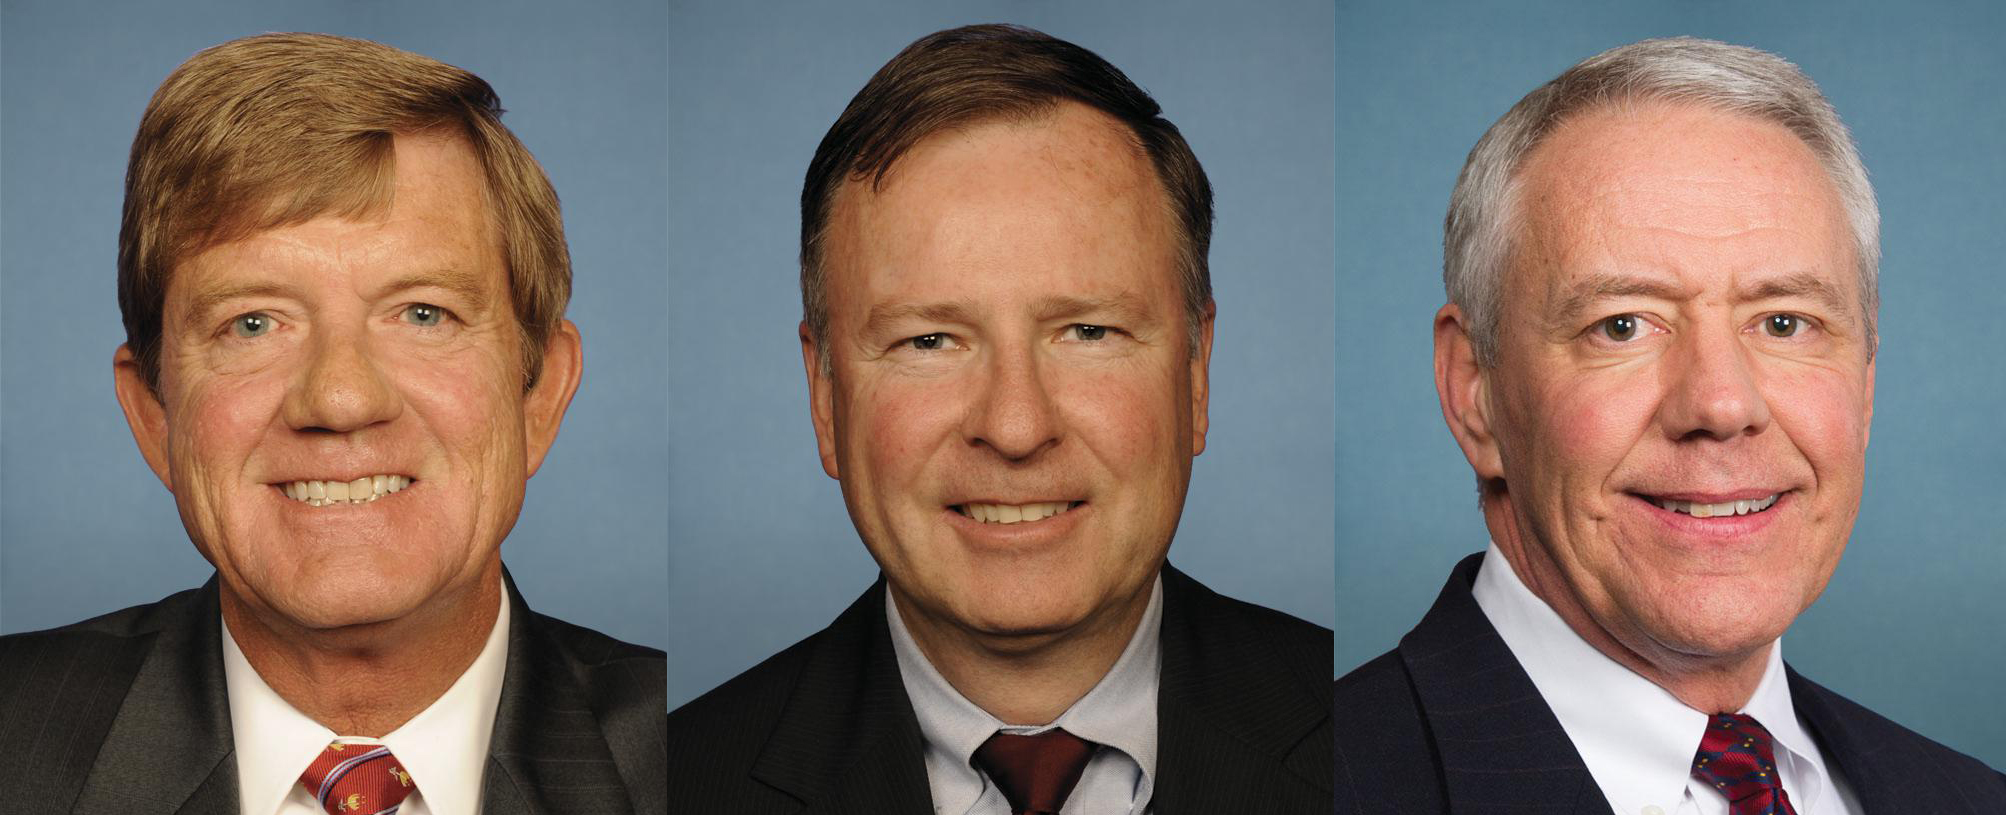 Southern Colorado's Congressmen, Republicans Scott Tipton, Doug Lamborn, and Ken Buck, all voted against impeaching President Donald Trump